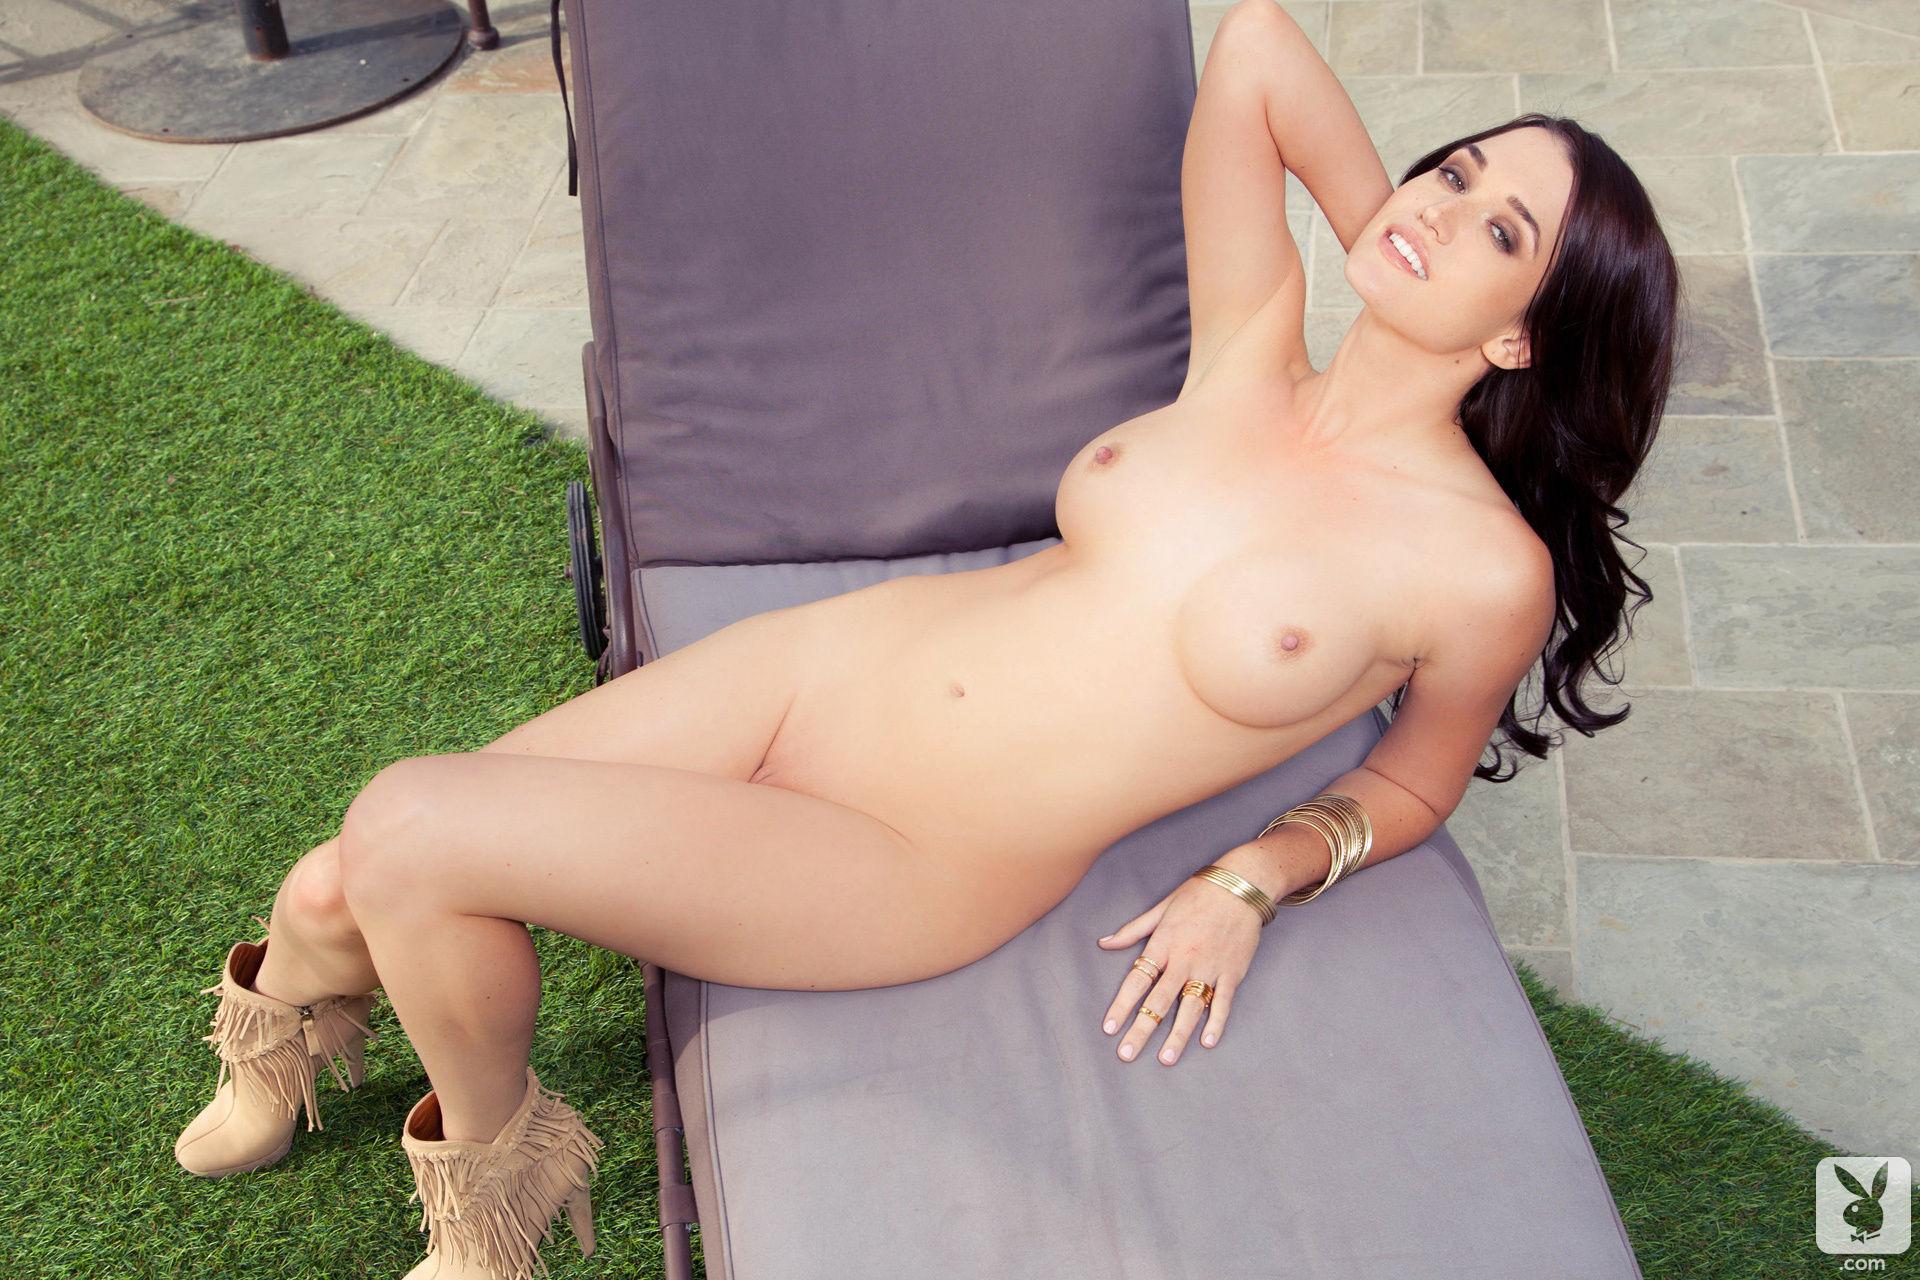 Jade Roper Tolbert nude photos for Playboy